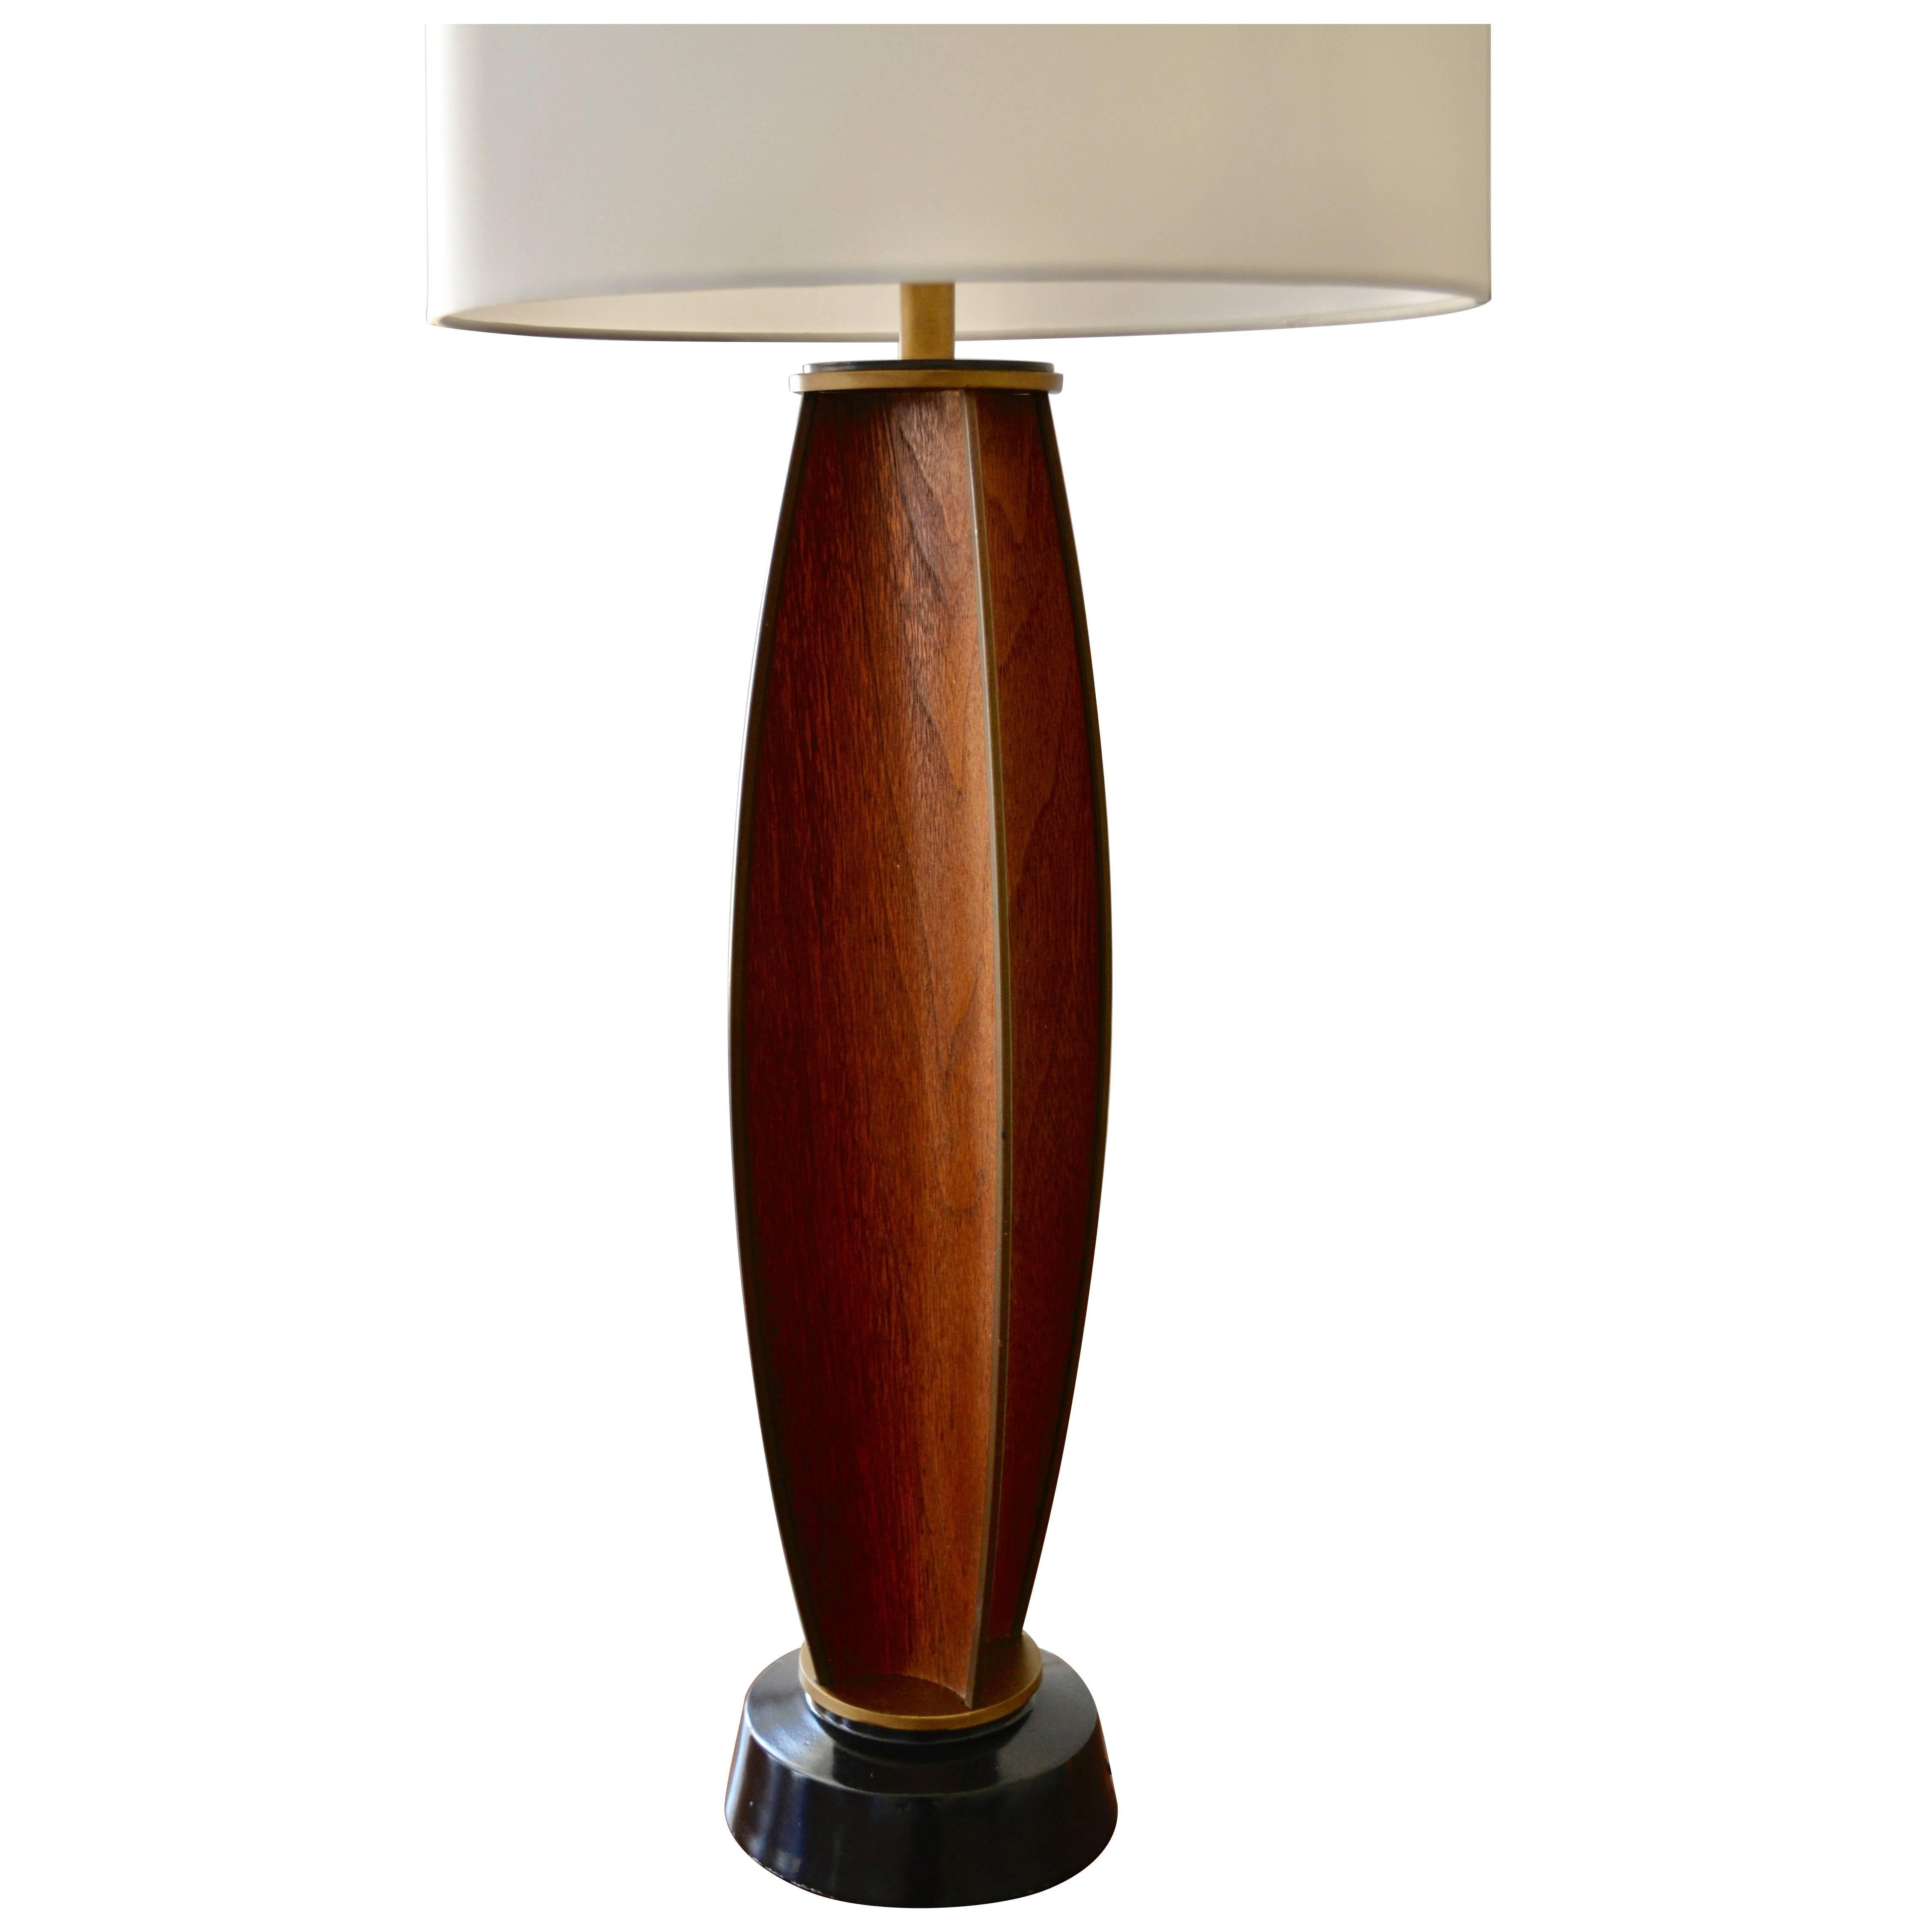 Gerald Thurston Parabolic Walnut and Brass Lightolier Table Lamp, circa 1956